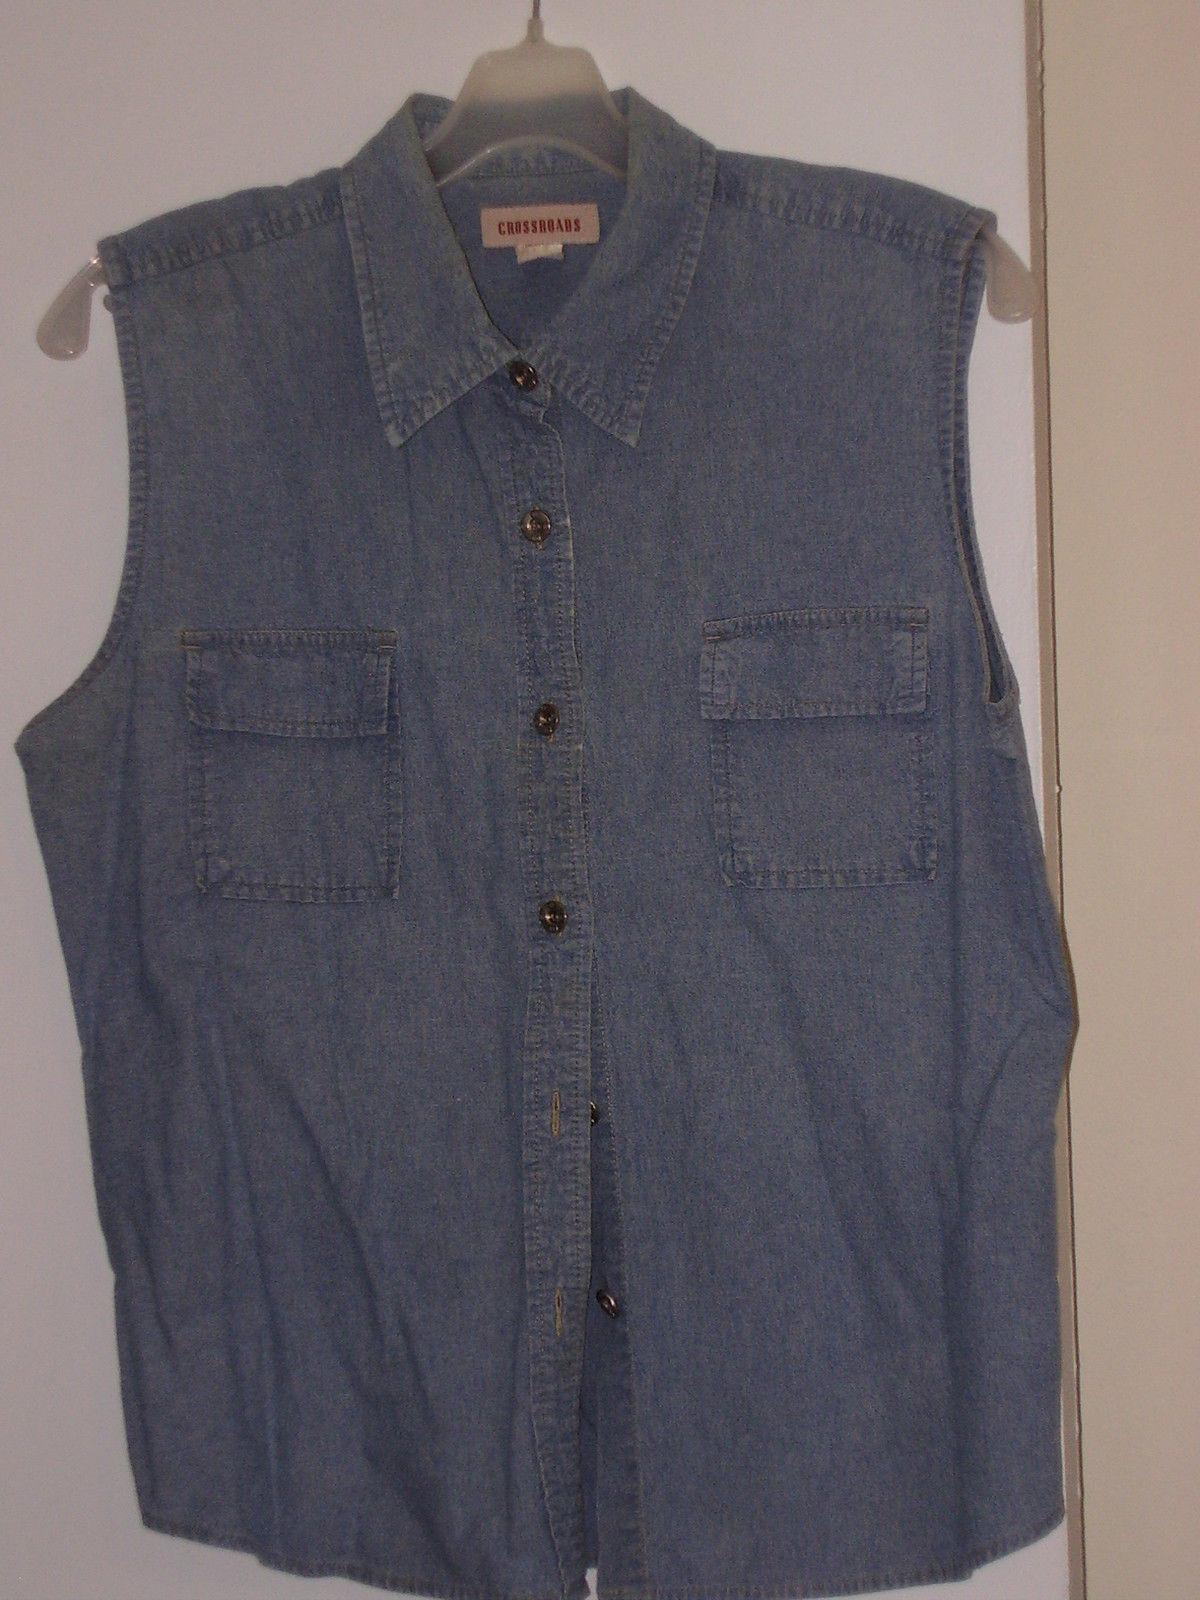 CROSSROADS  * SLEEVELESS  BLOUSE * L(14/16) - 100% COTTON -  DENIM BLUE - - $6.99